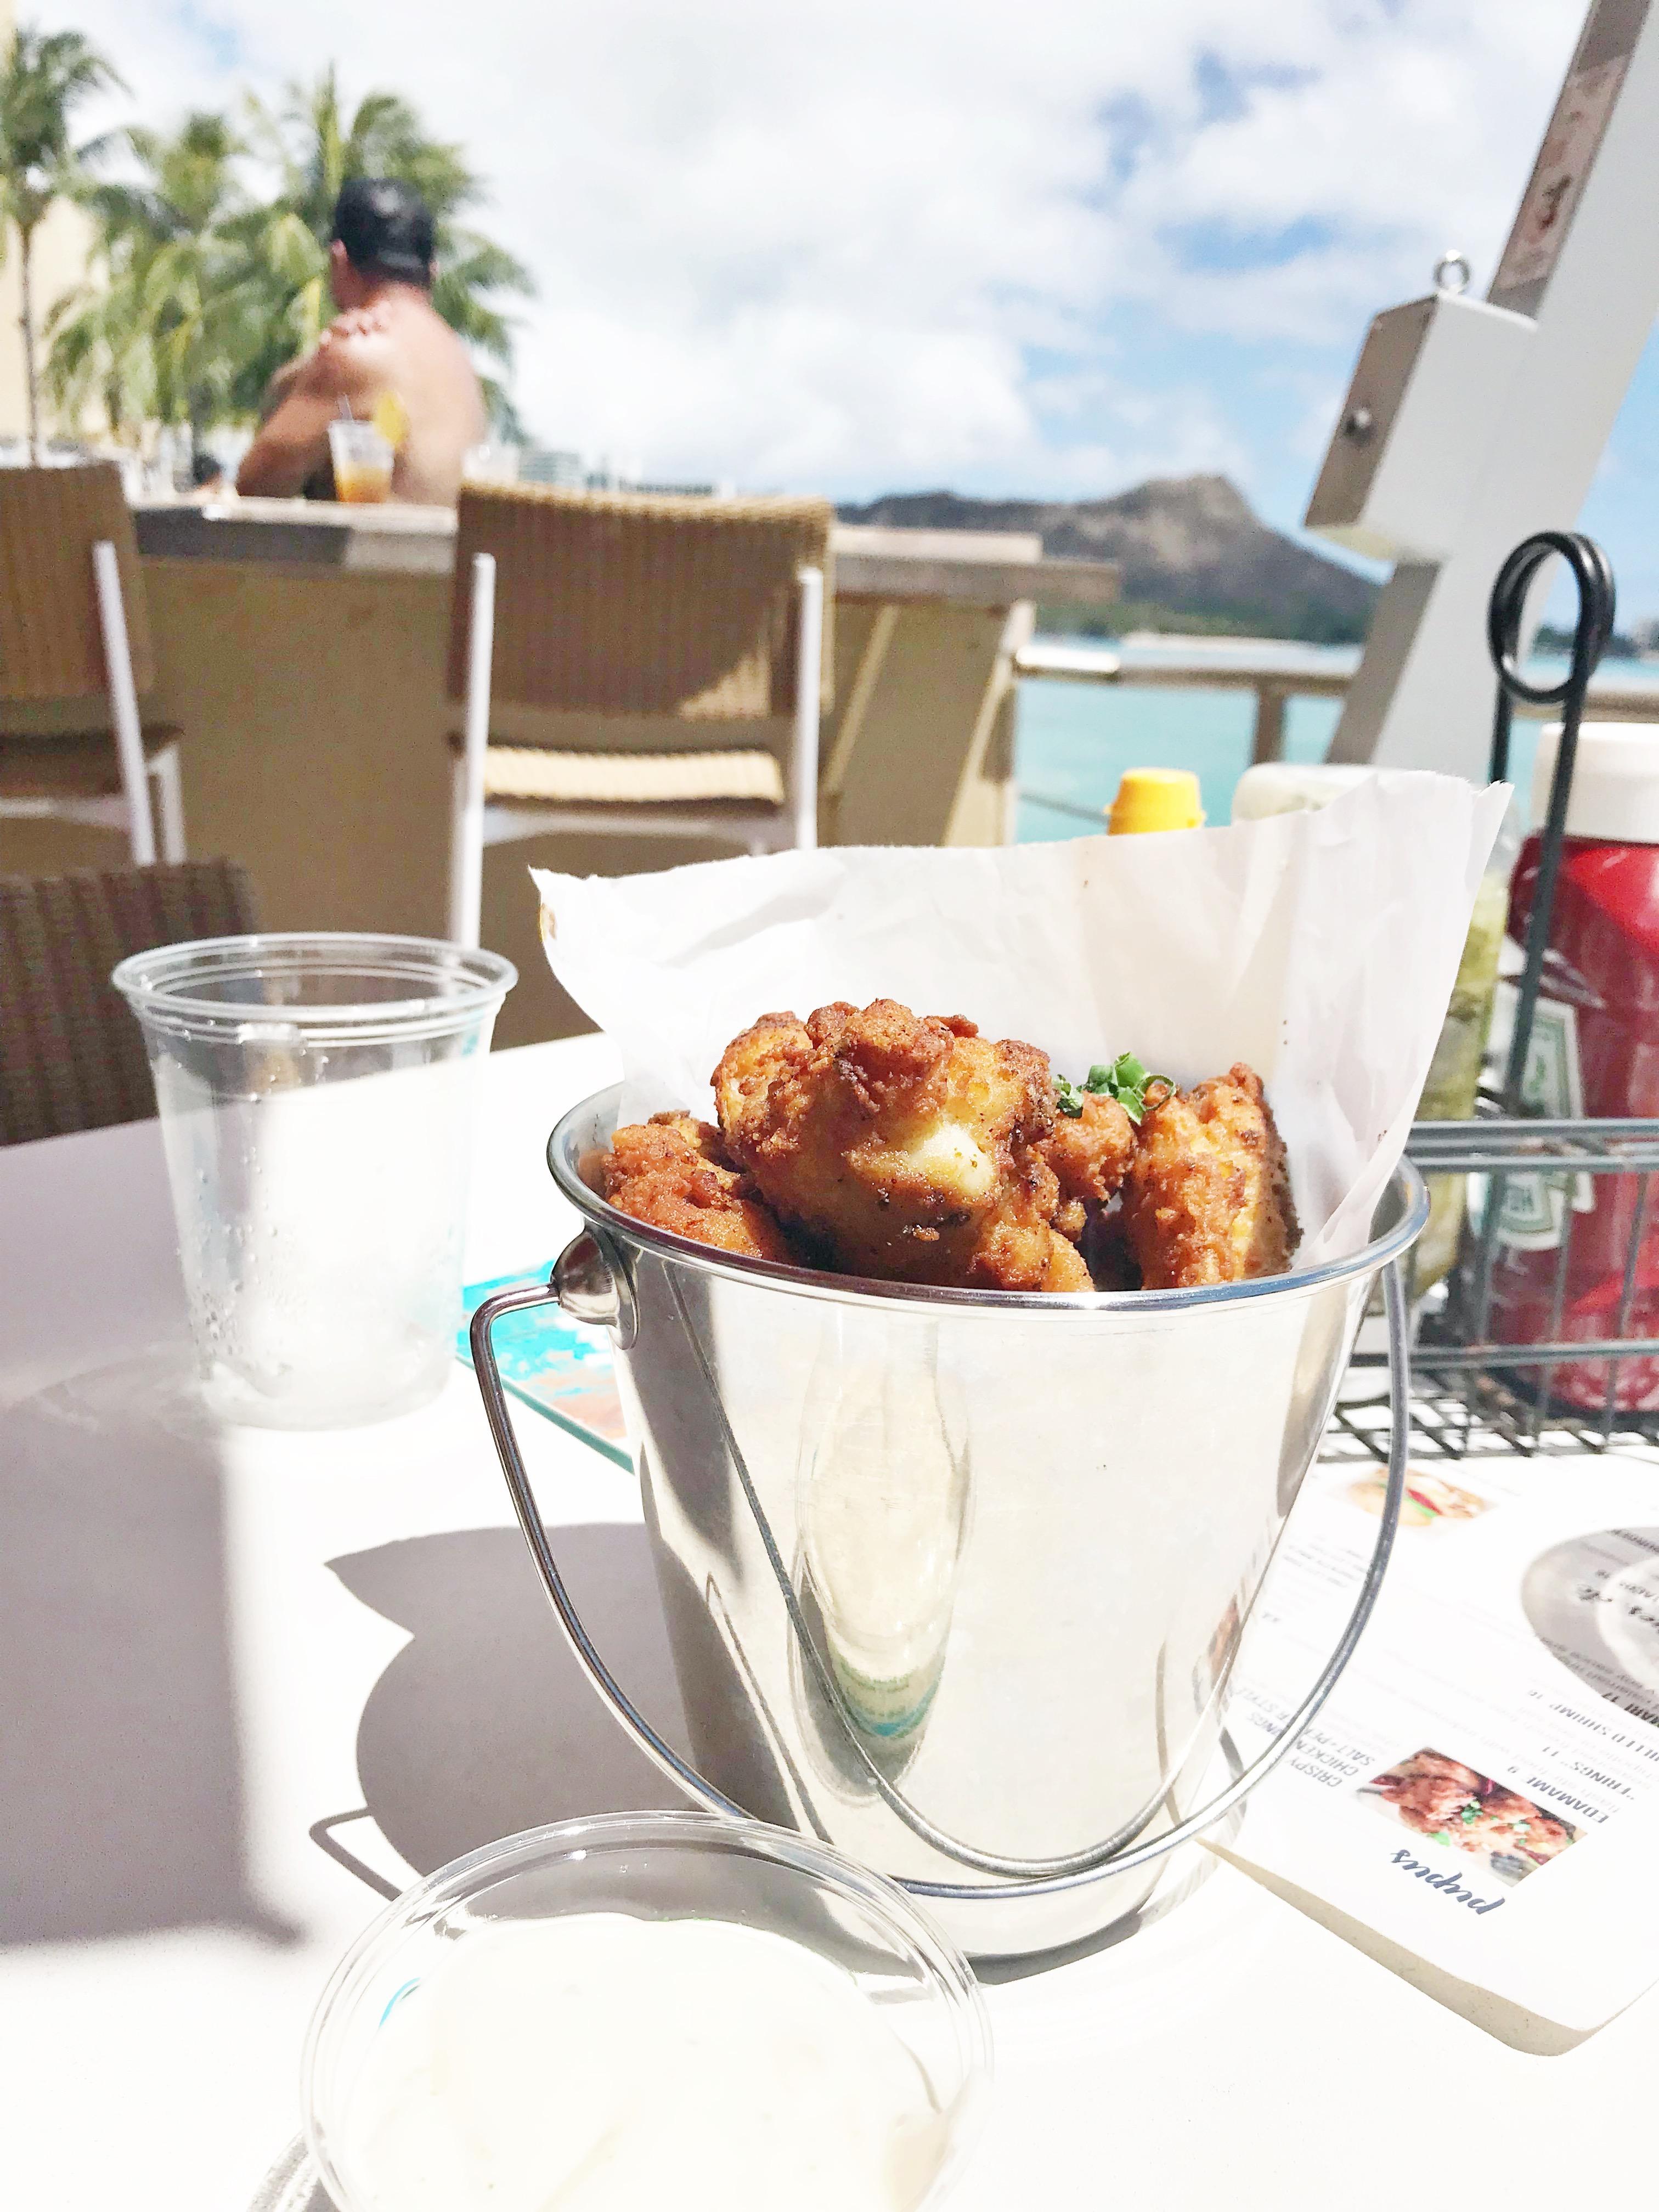 Our Stay At Sheraton Waikiki - Sheraton Hotels Hawaii - Sheraton Waikiki Room - Sheraton Waikiki Resort - Honolulu Hotels - Oahu Hotels - Hawaii Hotel - Resorts In Hawaii - Honolulu Resort - Communikait by Kait Hanson #honolulu #hawaii #beachresort #hawaiihotel #sheratonwaikiki #sheraton #starwoodhotels